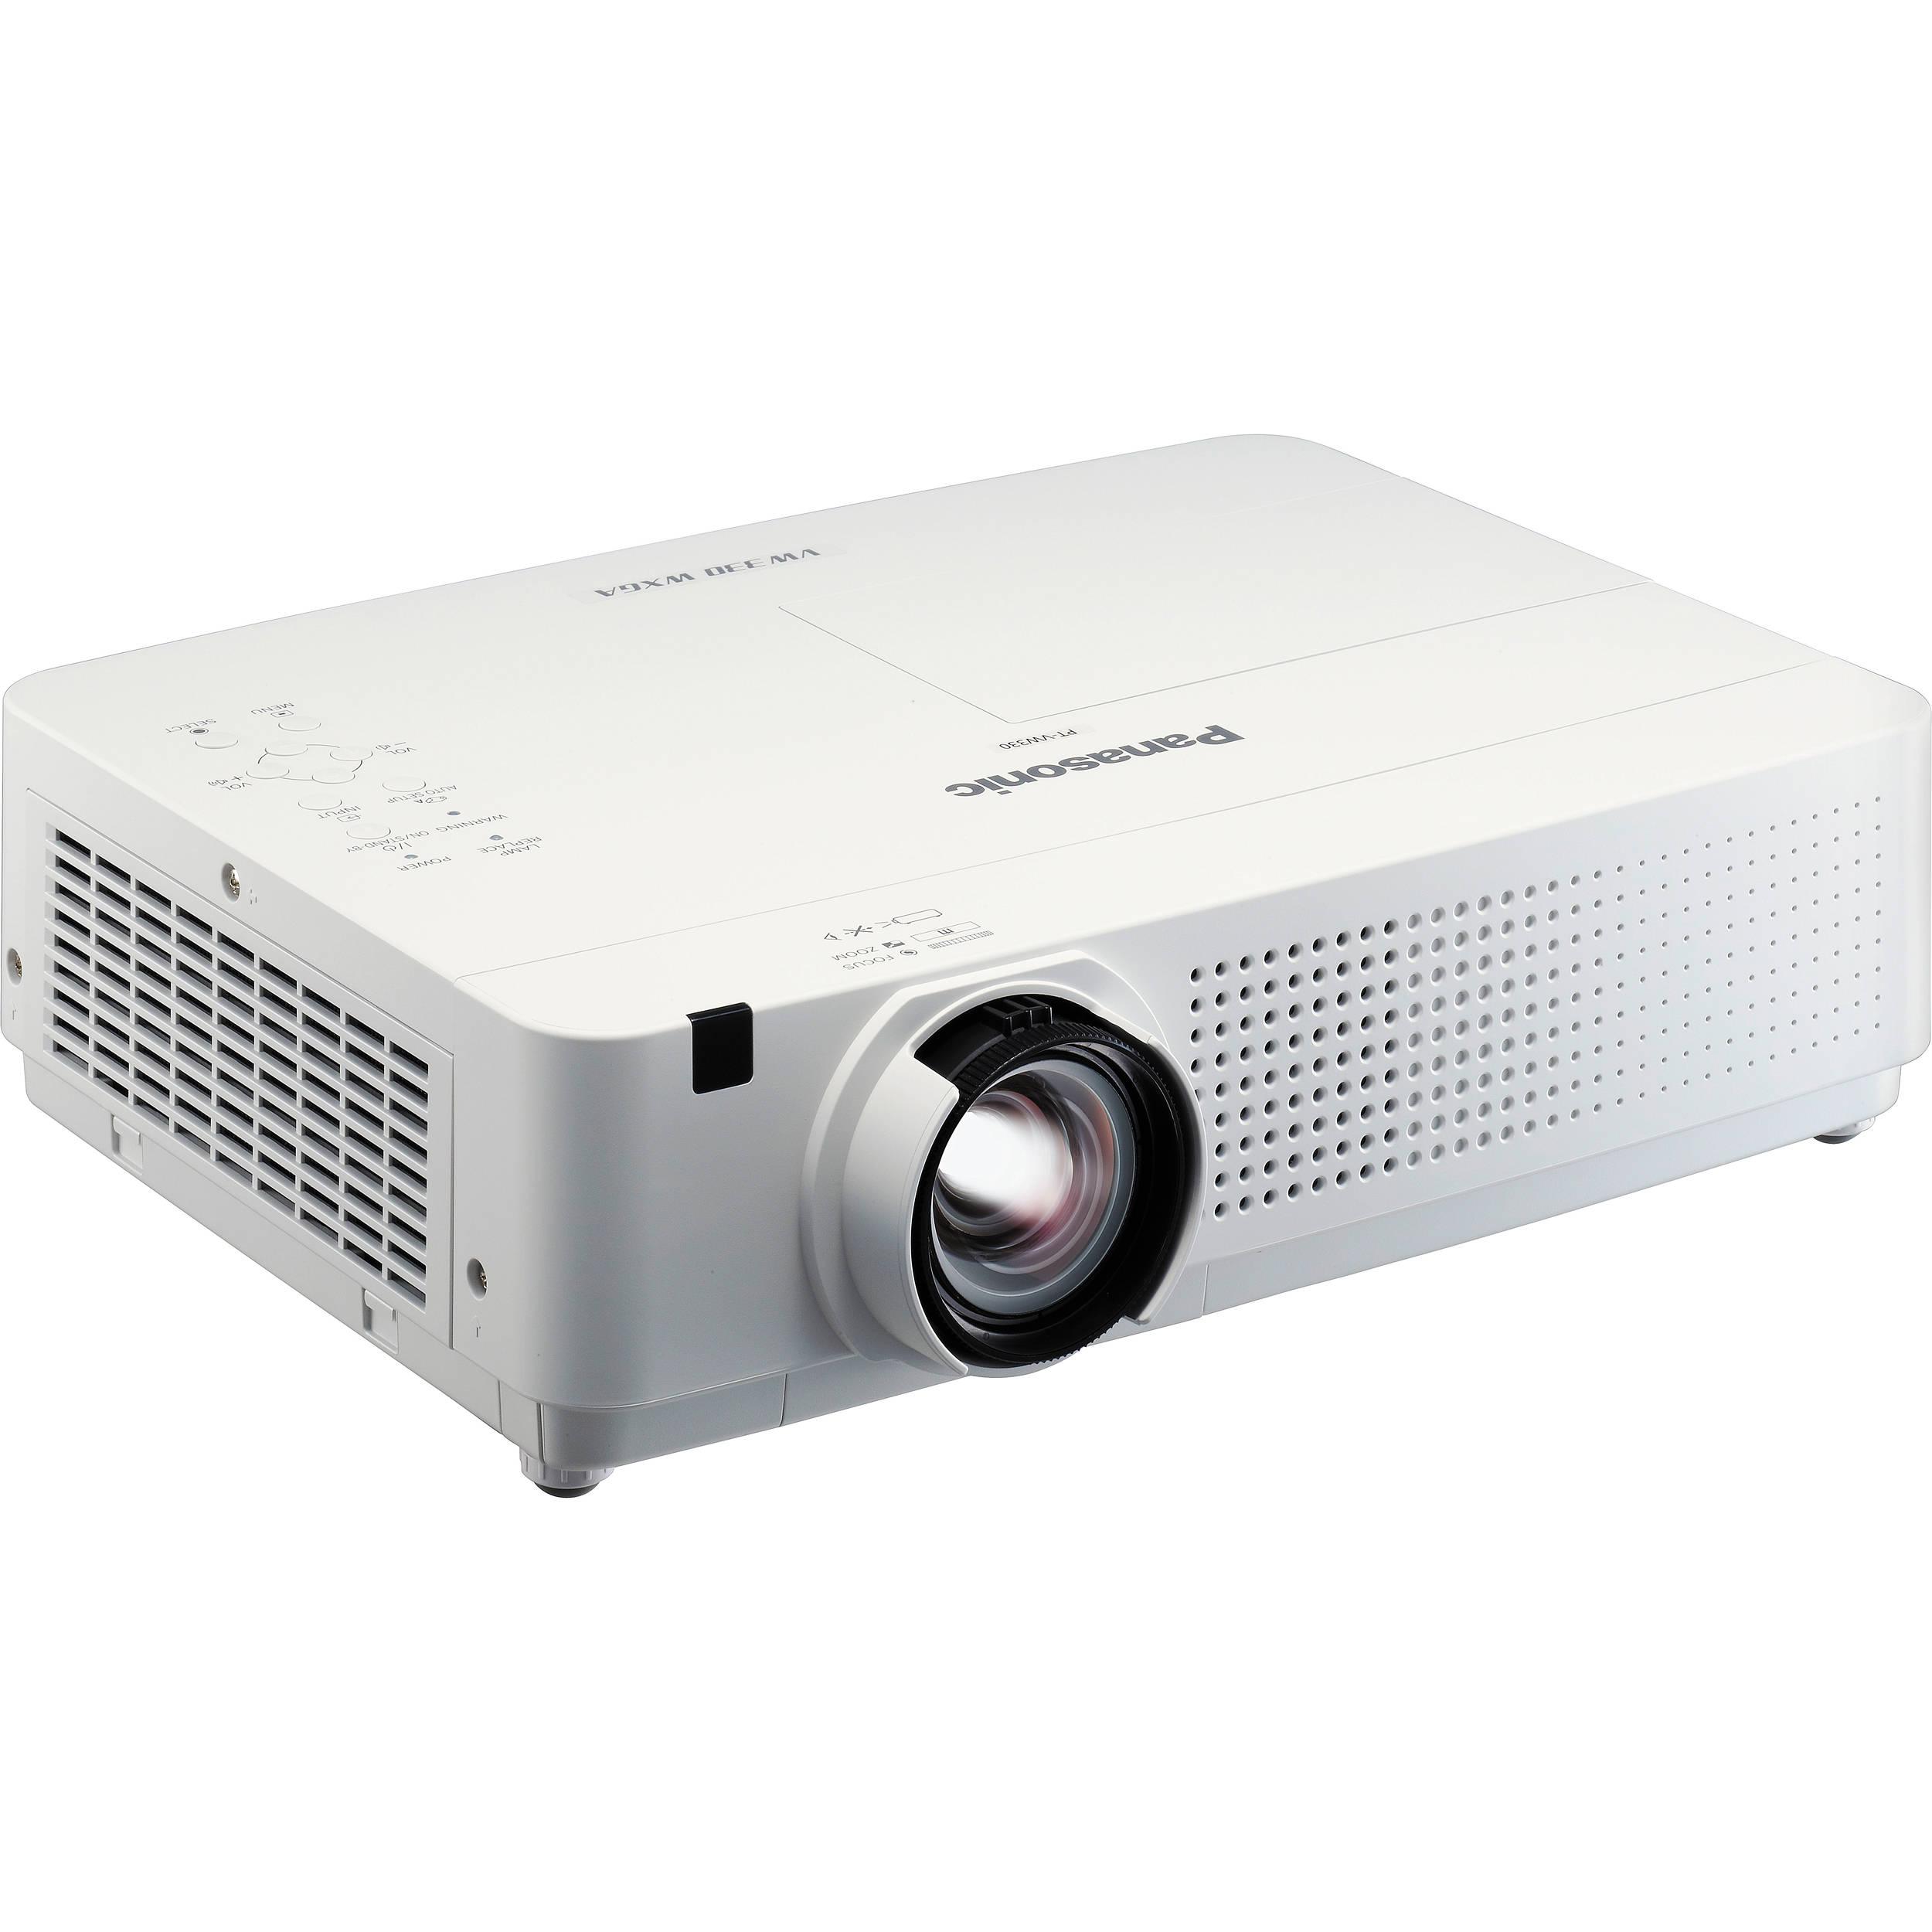 Panasonic PT-VX400U 3 LCD Projector PT-VX400U B&H Photo Video